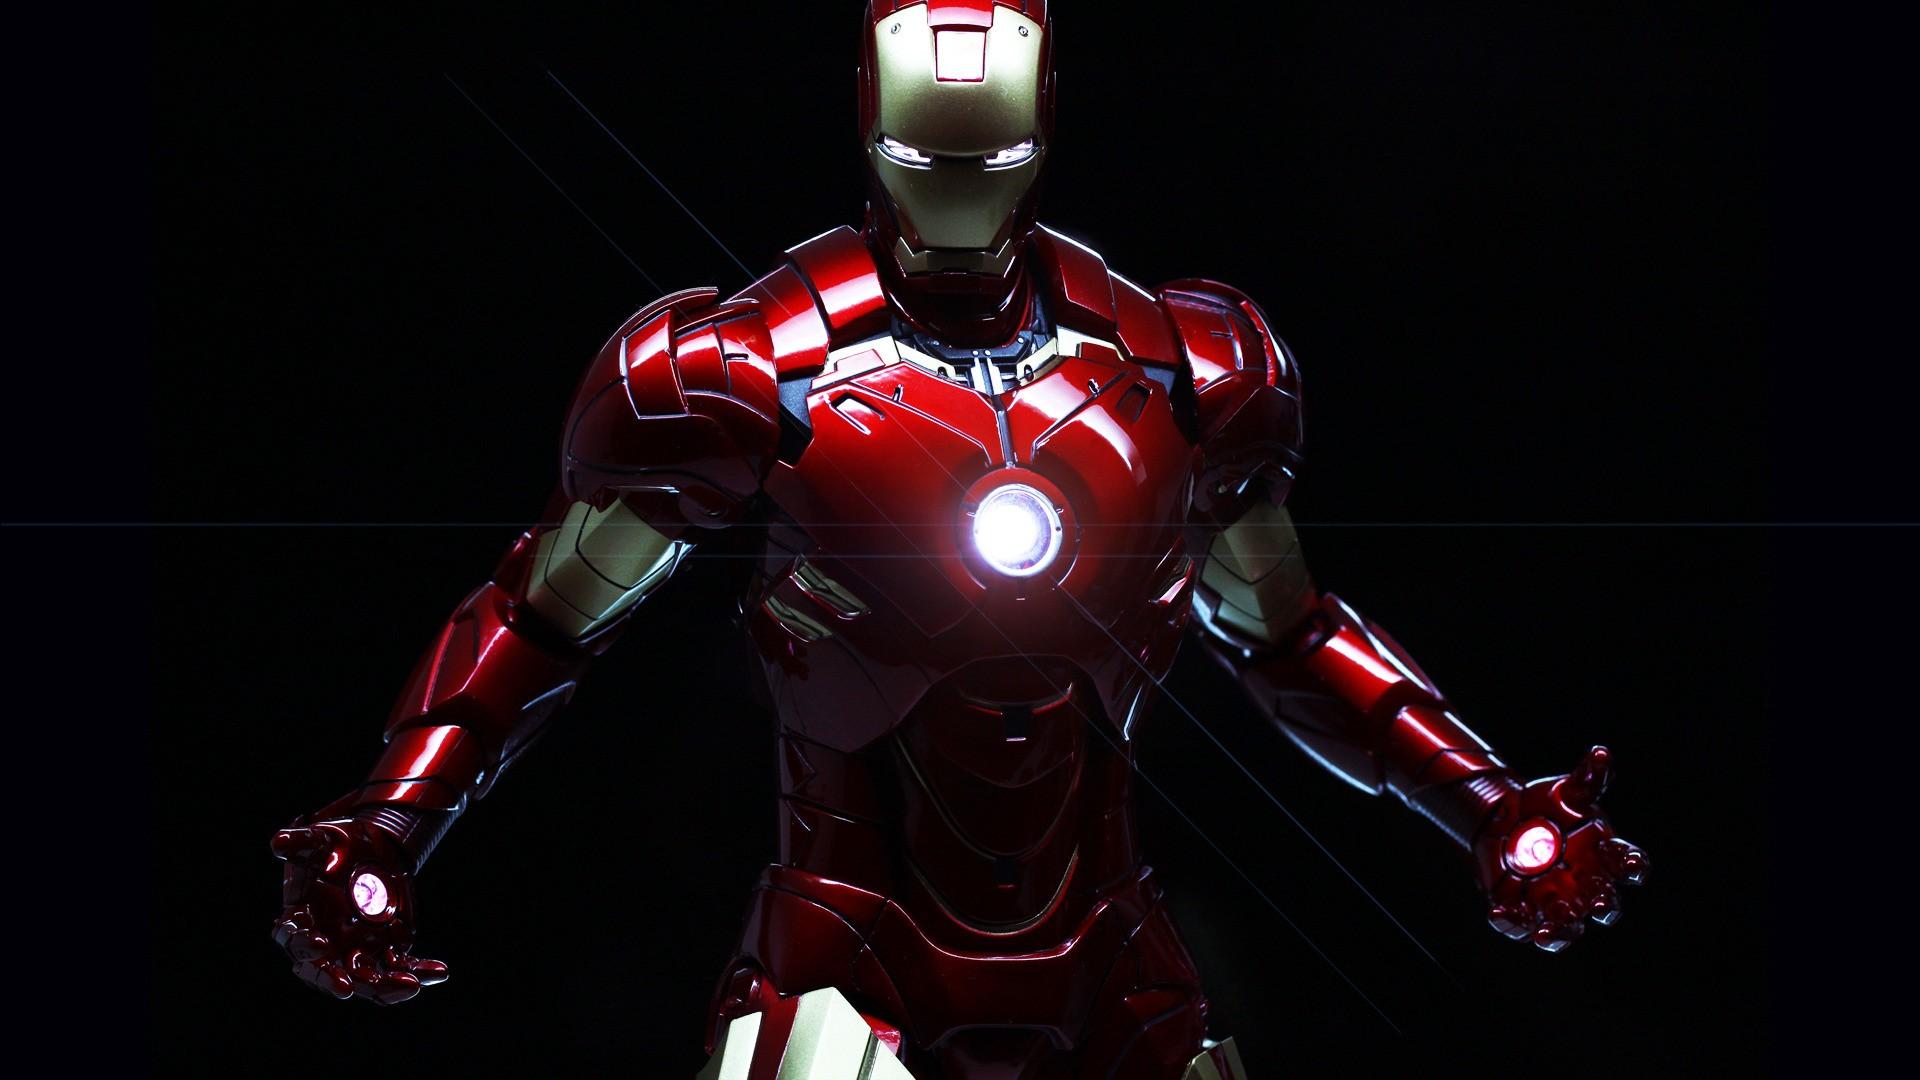 Hd wallpaper superhero - High Resolution Superhero Iron Man Wallpaper Hd Siwallpaperhd 18890